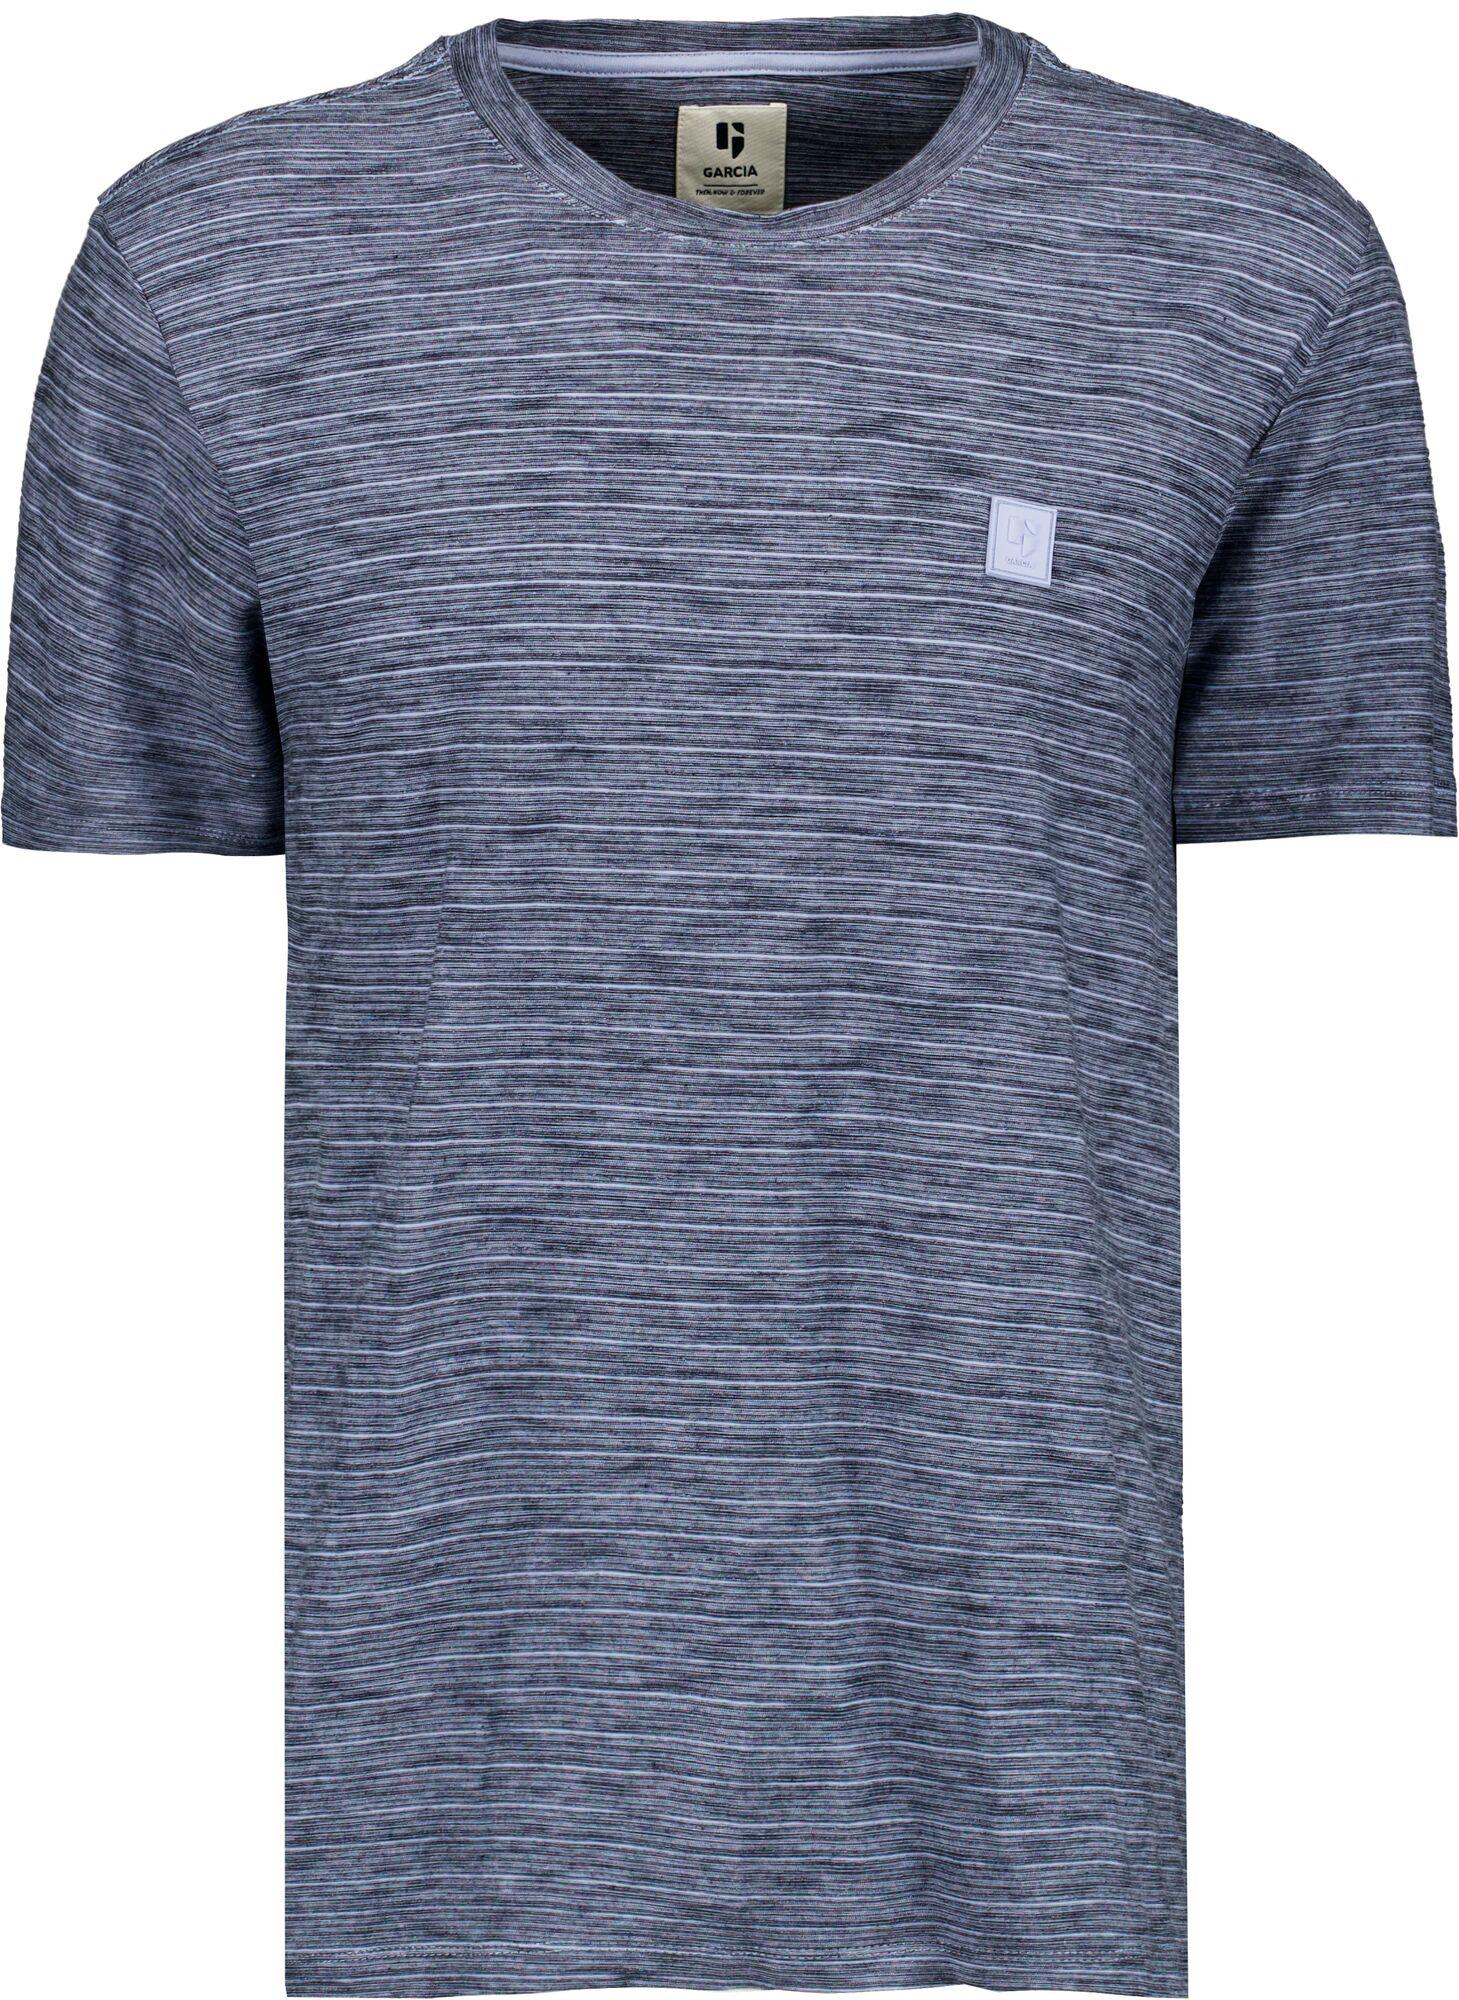 Garcia - Men-T-Shirts s.sl.